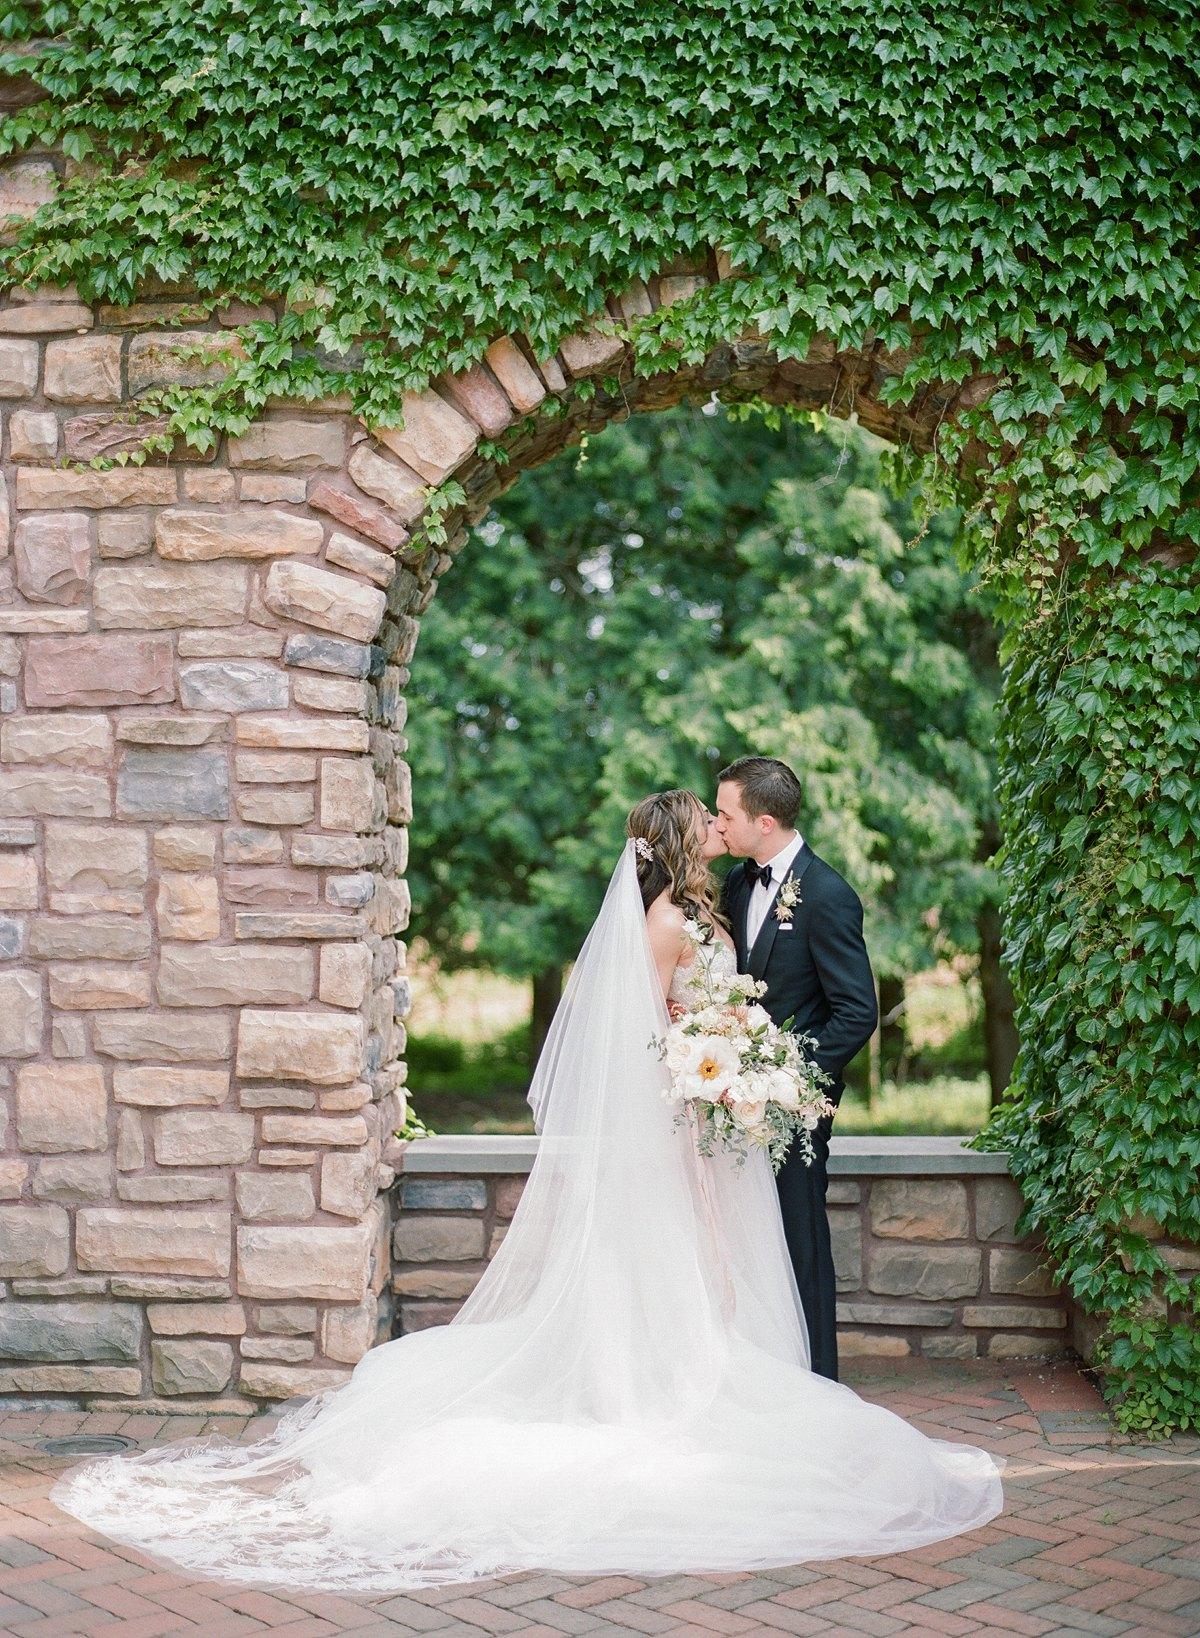 The Styled Bride | Ashford Estate | Rebecca Yale Photography